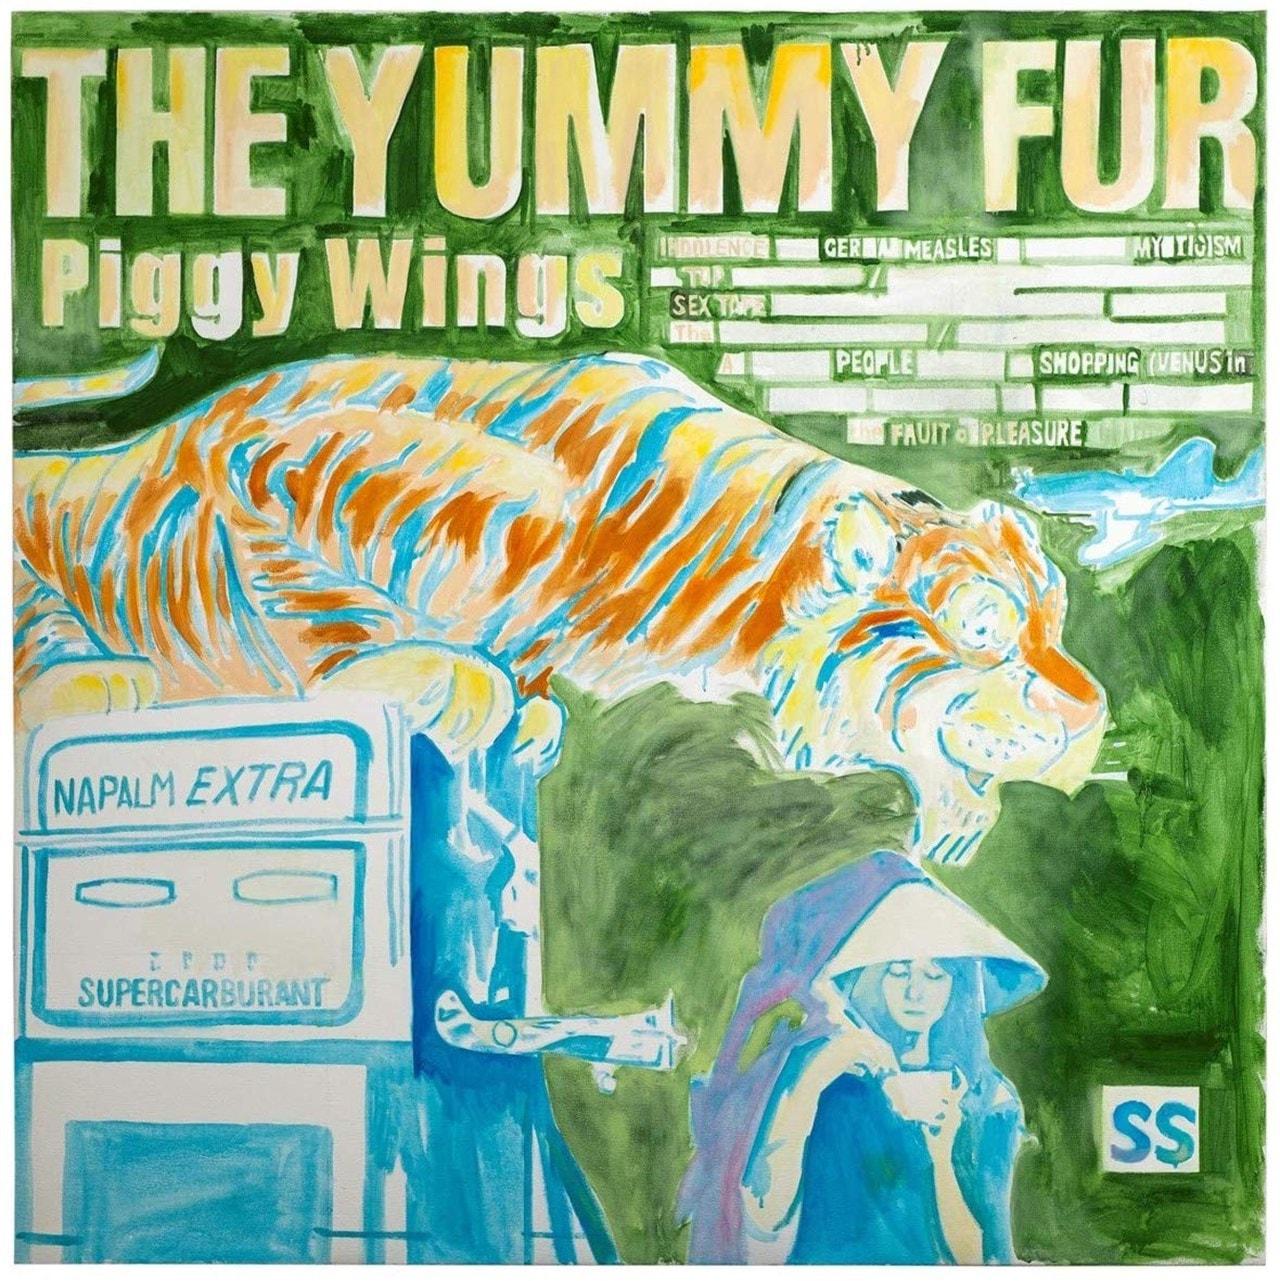 Piggy Wings - 1